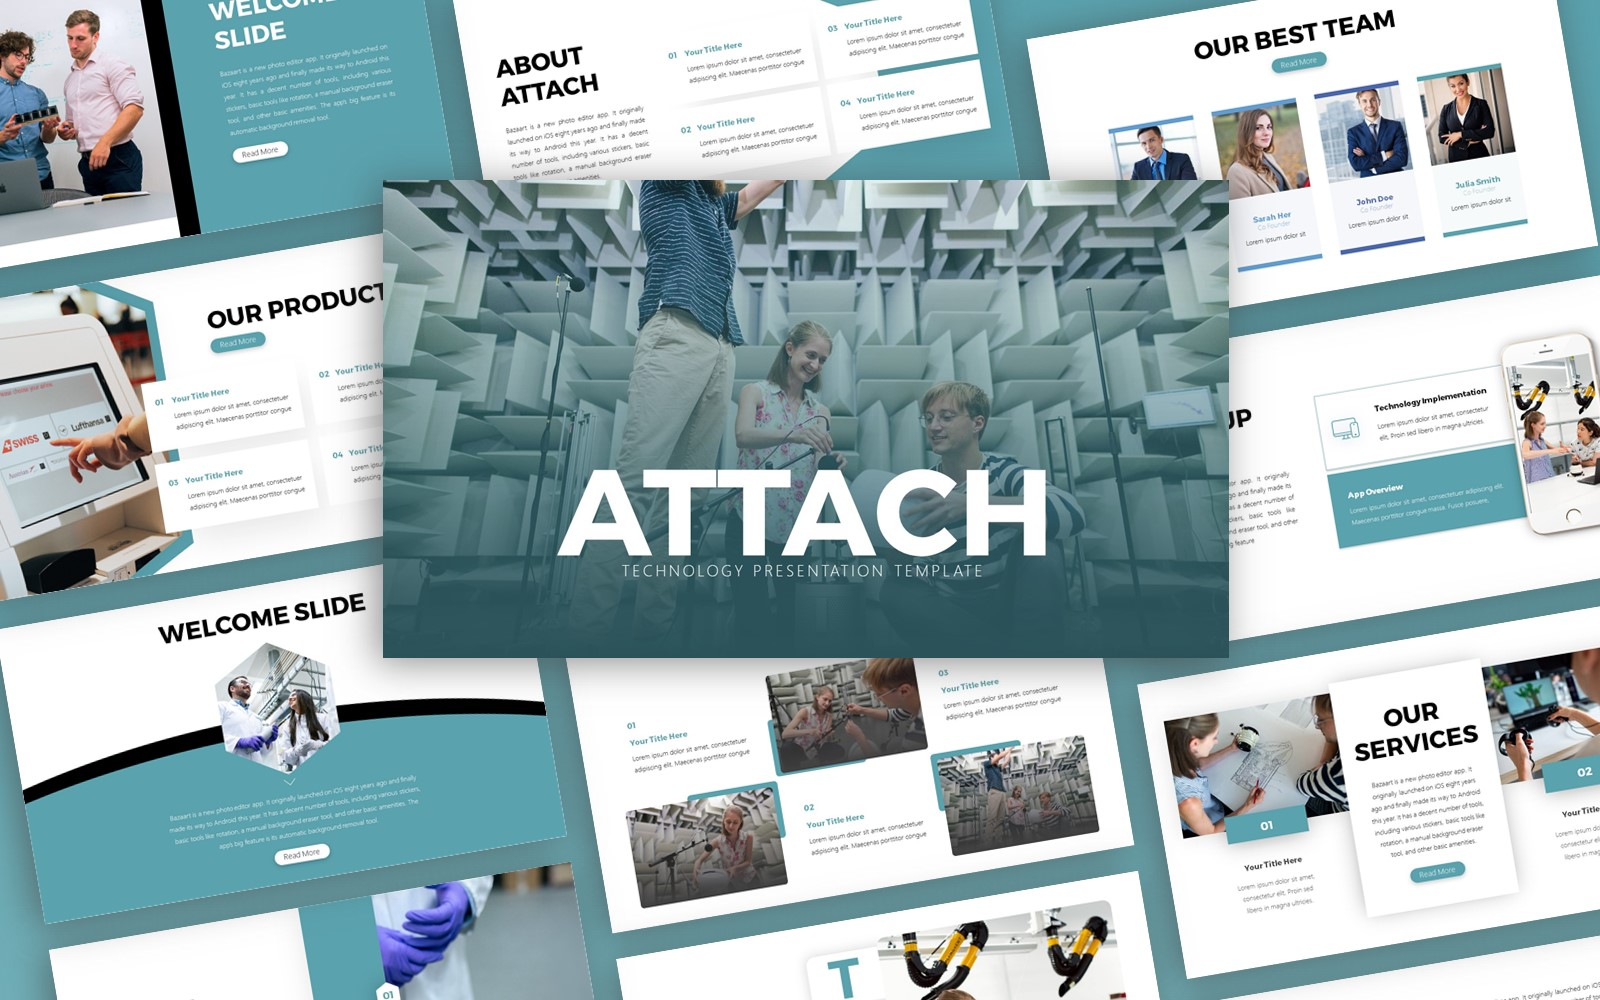 Attach Technology Presentation PowerPoint Template